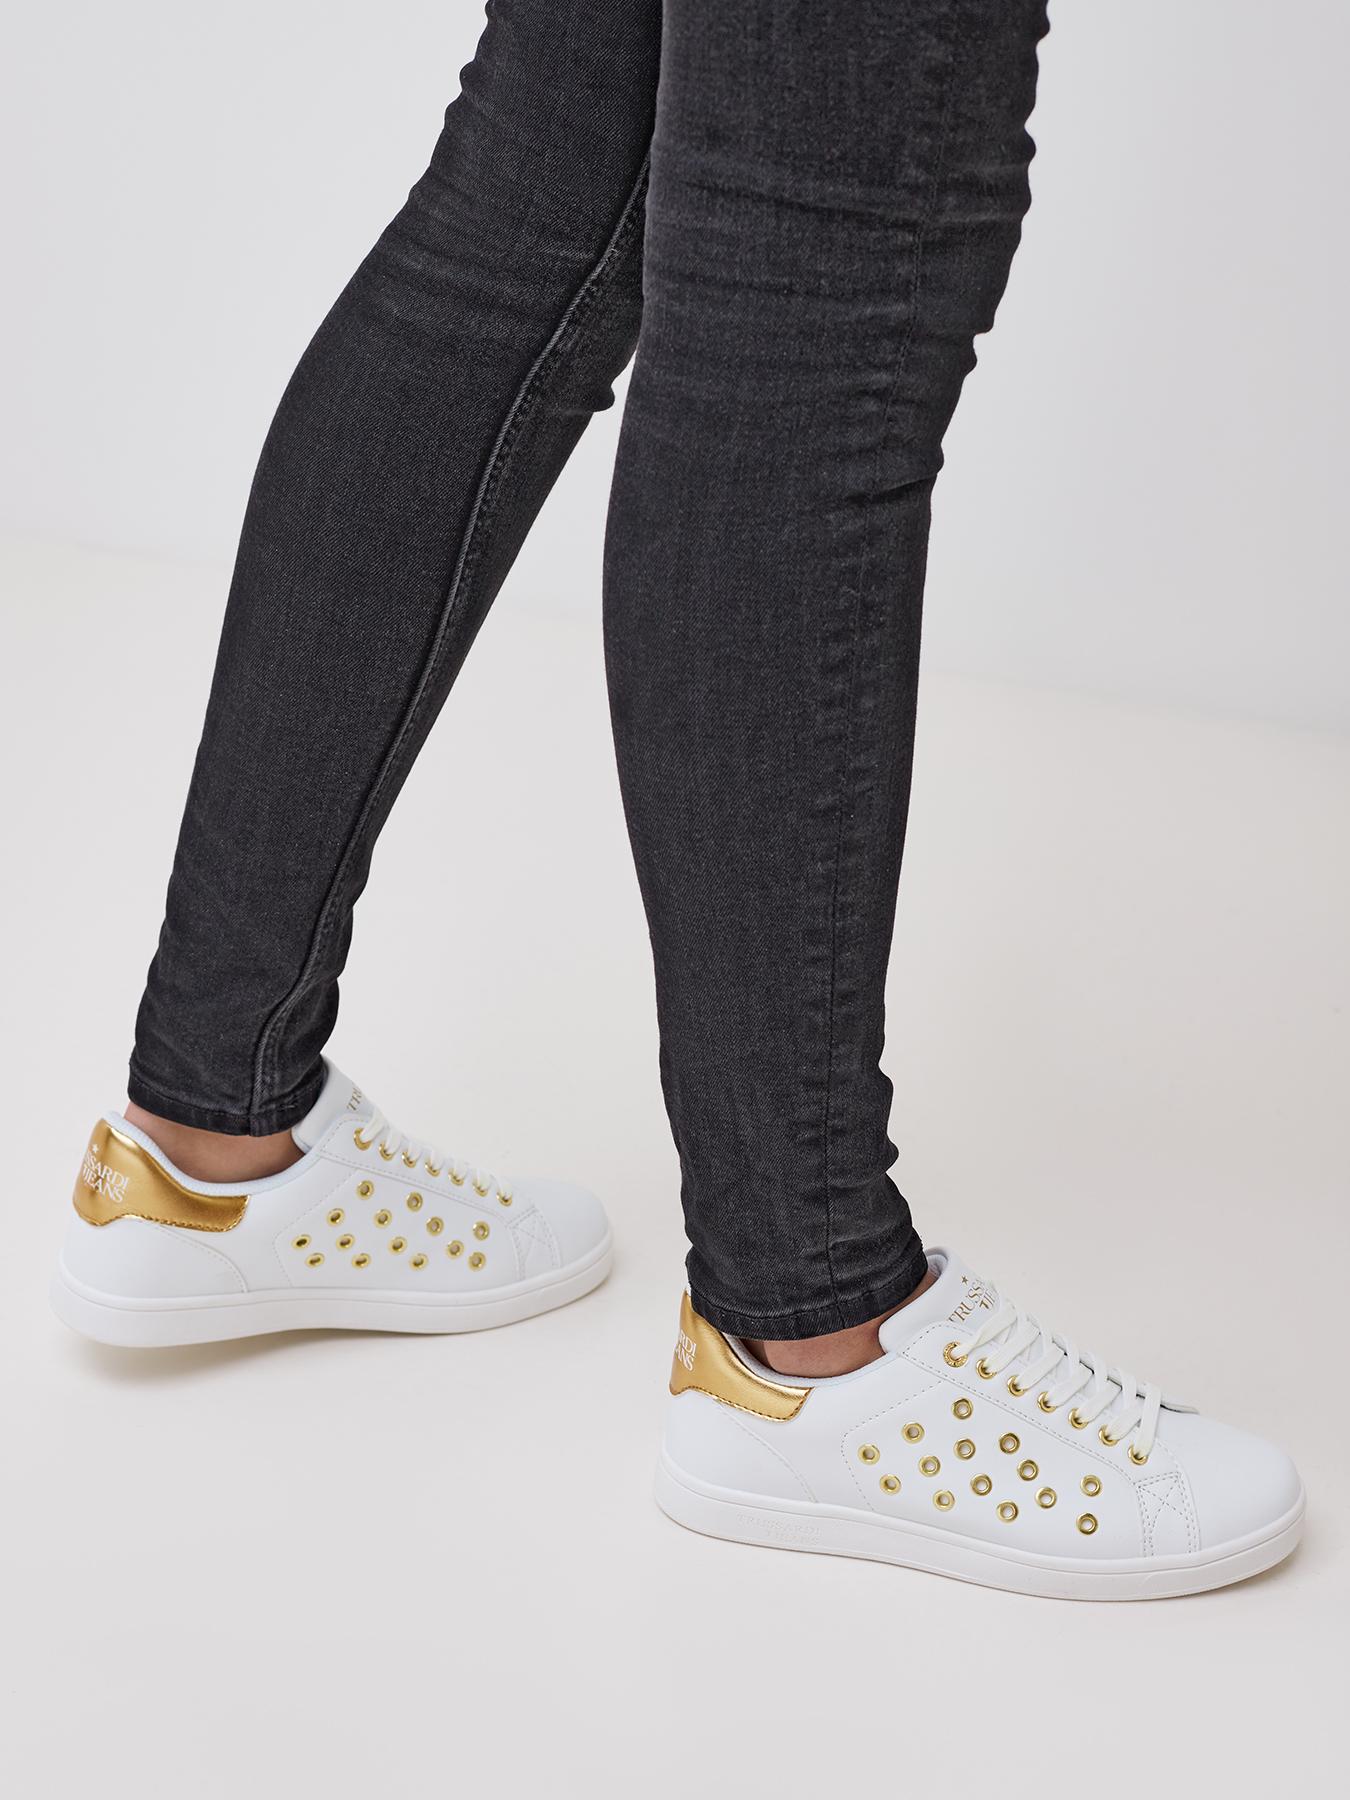 цена на Кроссовки Trussardi Jeans Кеды